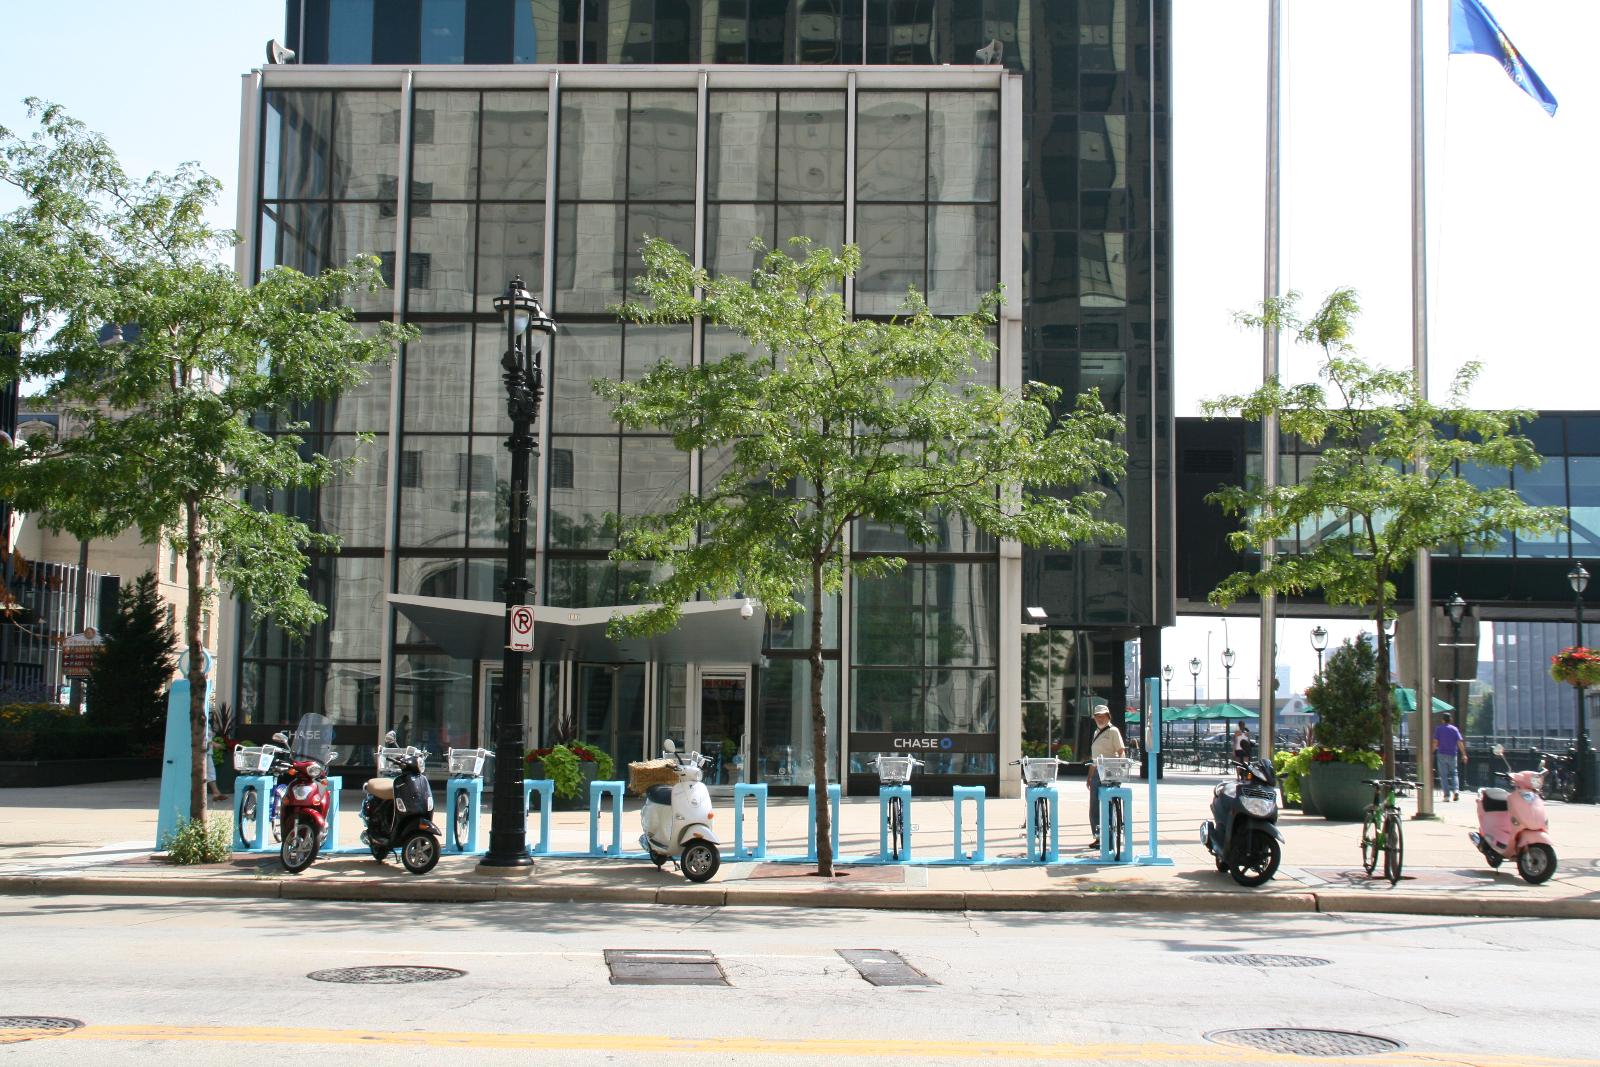 Bublr Bikes at Chase Tower